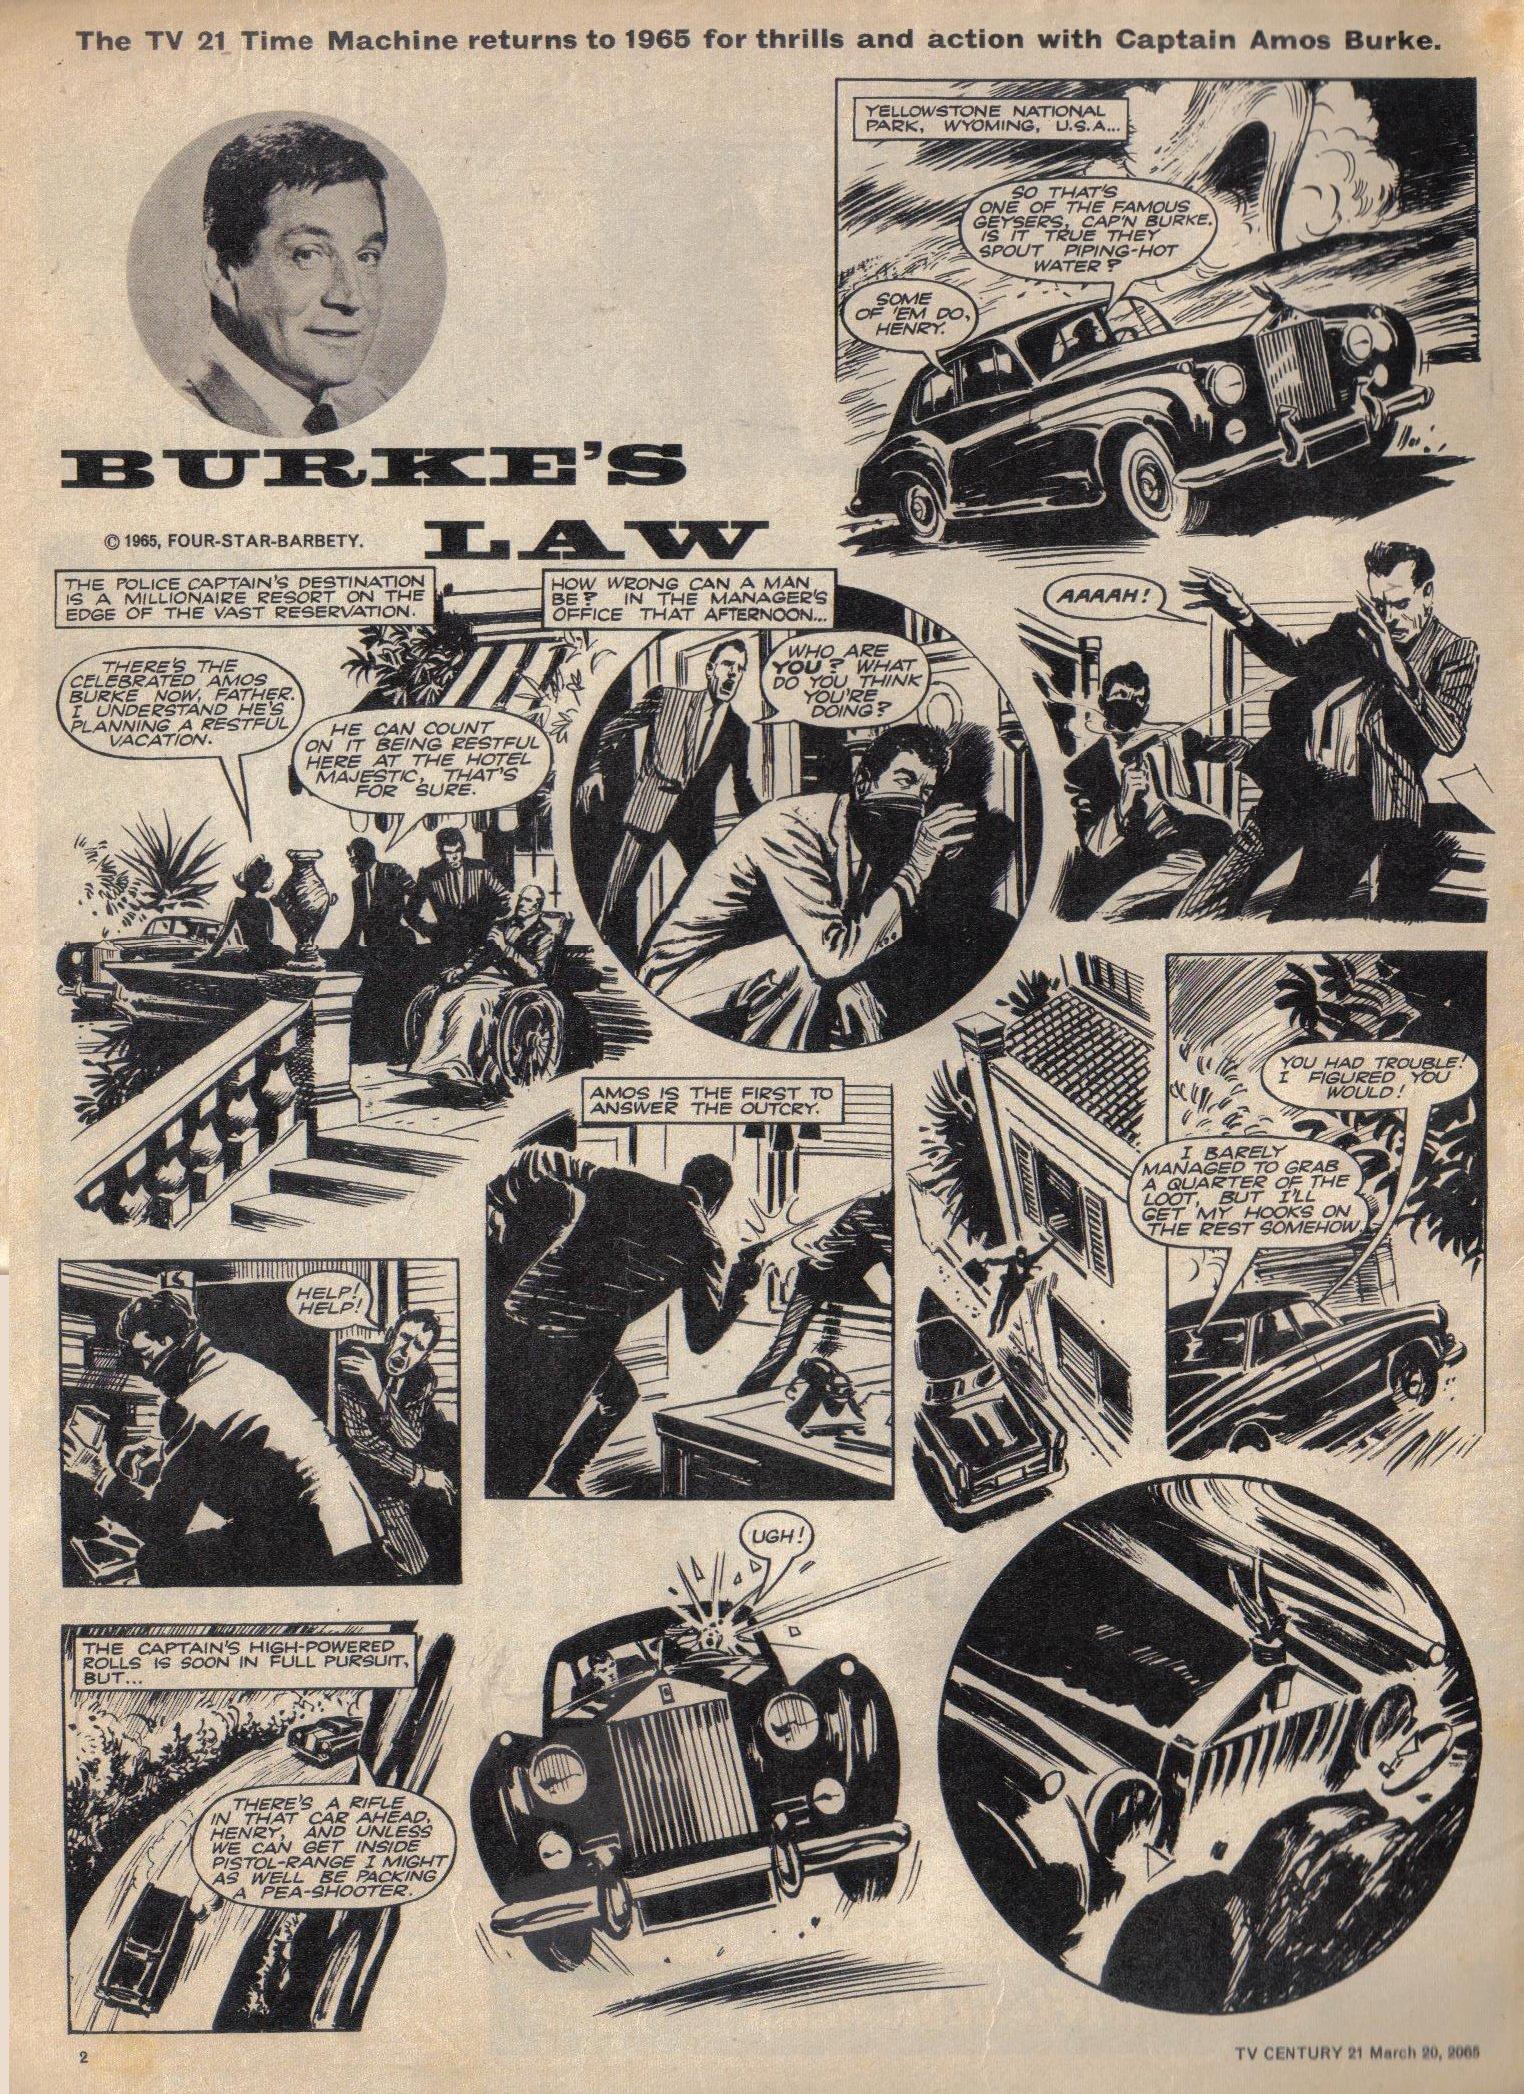 Read online TV Century 21 (TV 21) comic -  Issue #9 - 3